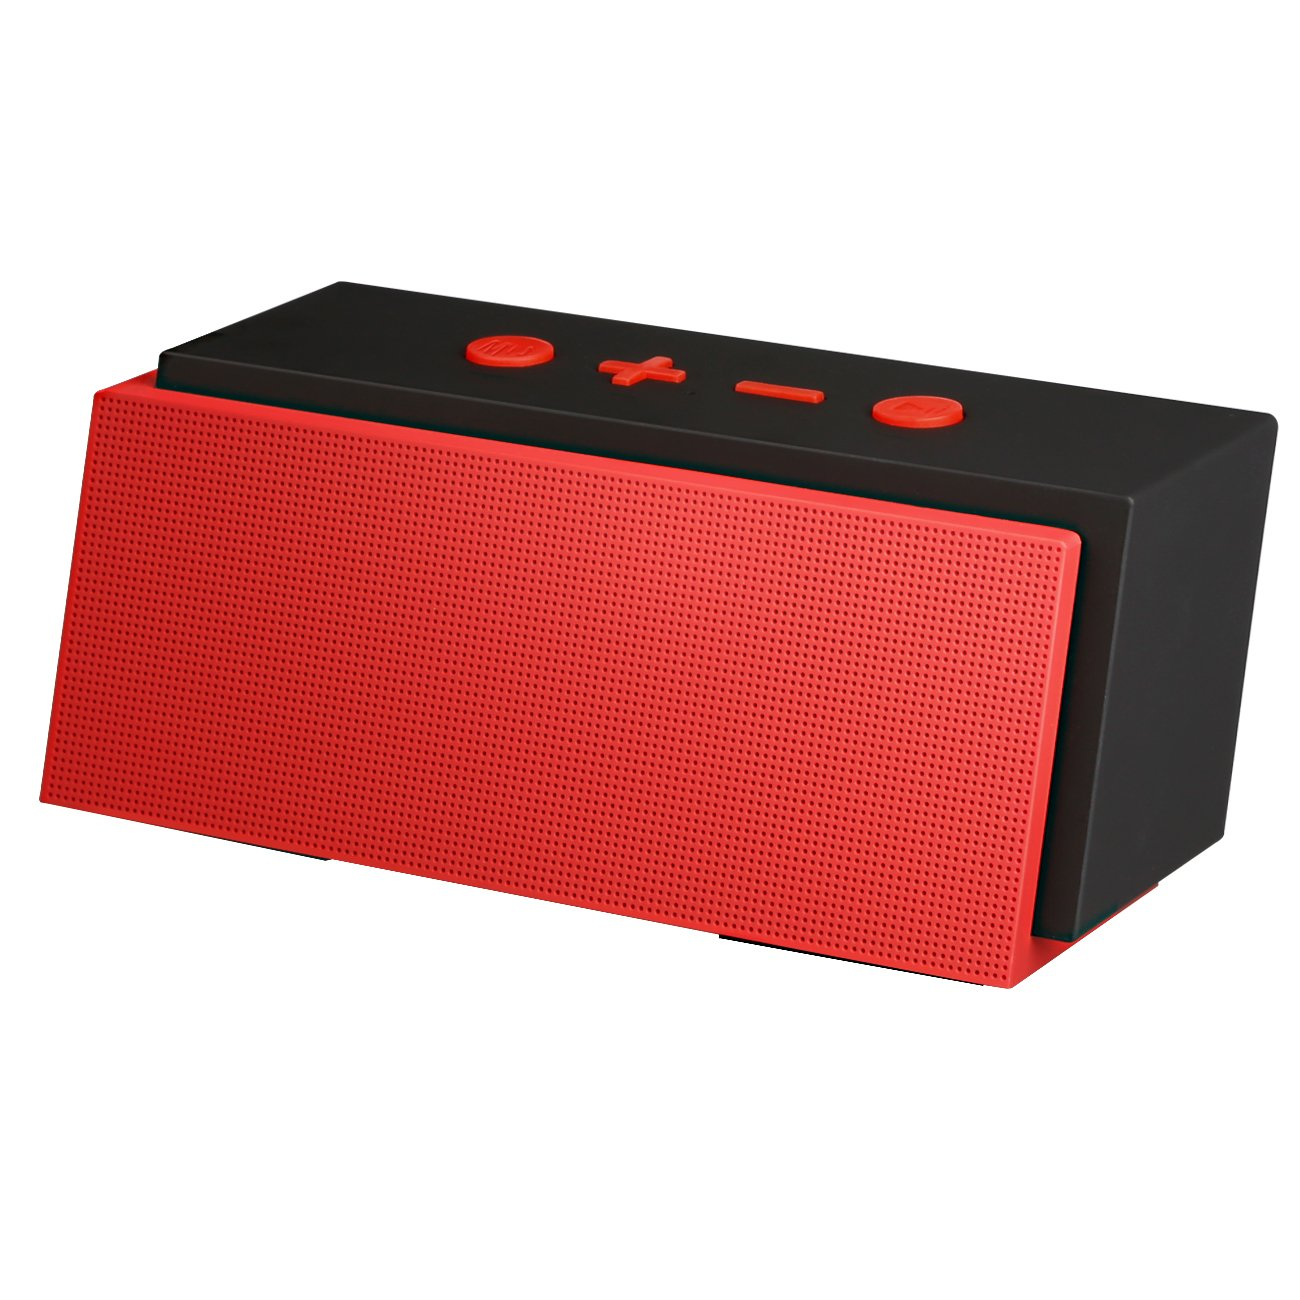 Inateck Marsbox Bluetooth 4.0 Wireless Speaker